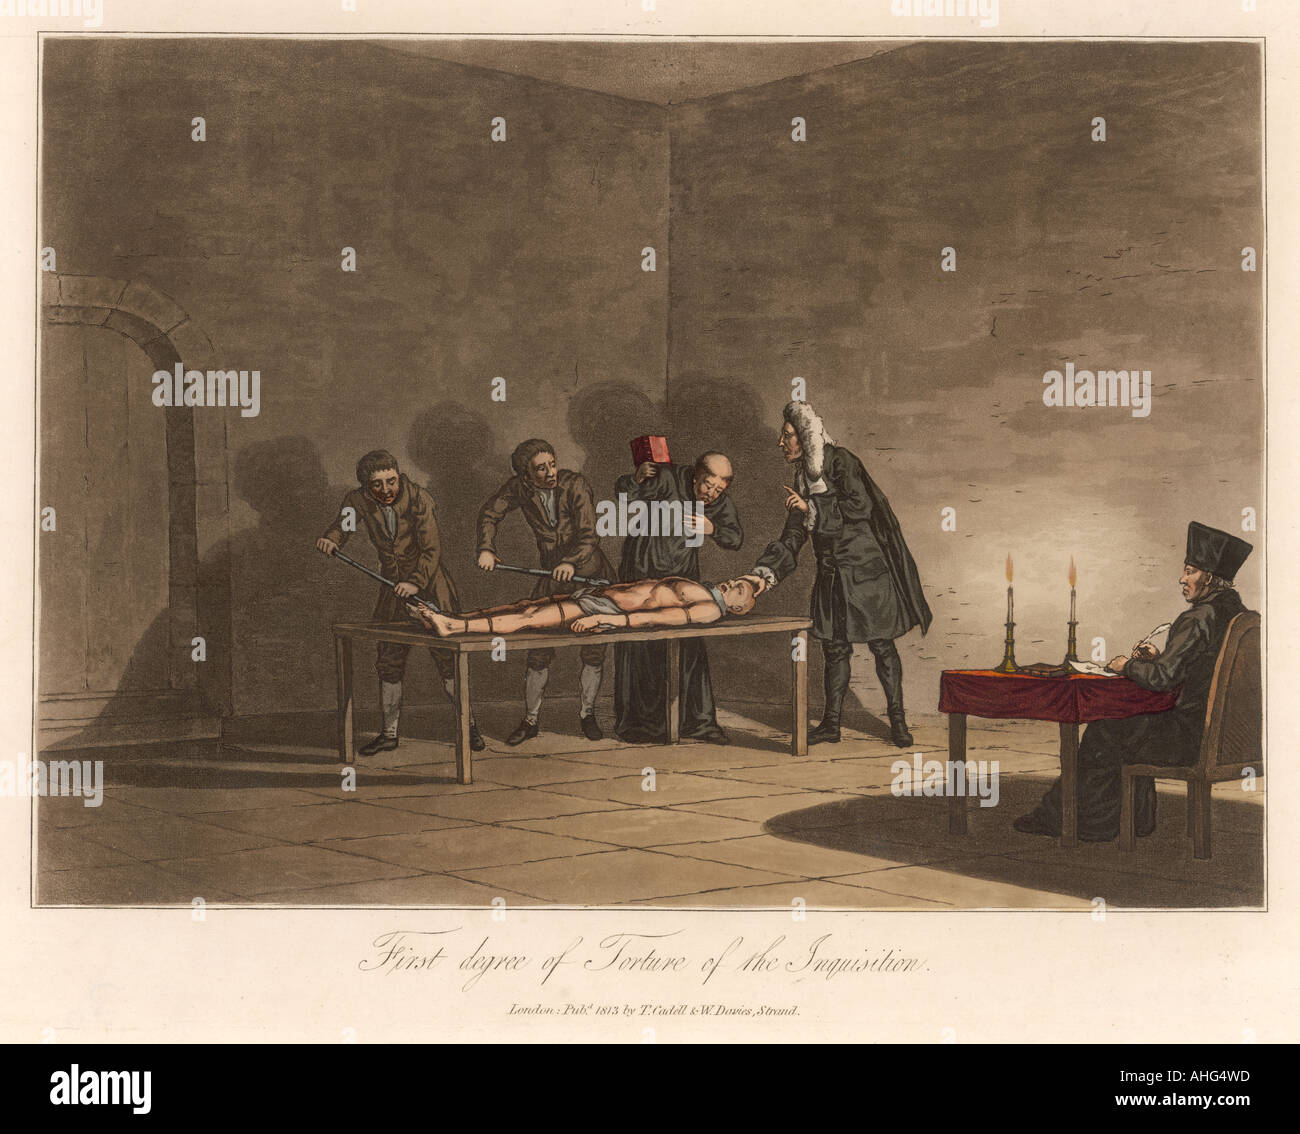 Inquisition Torture 1 - Stock Image